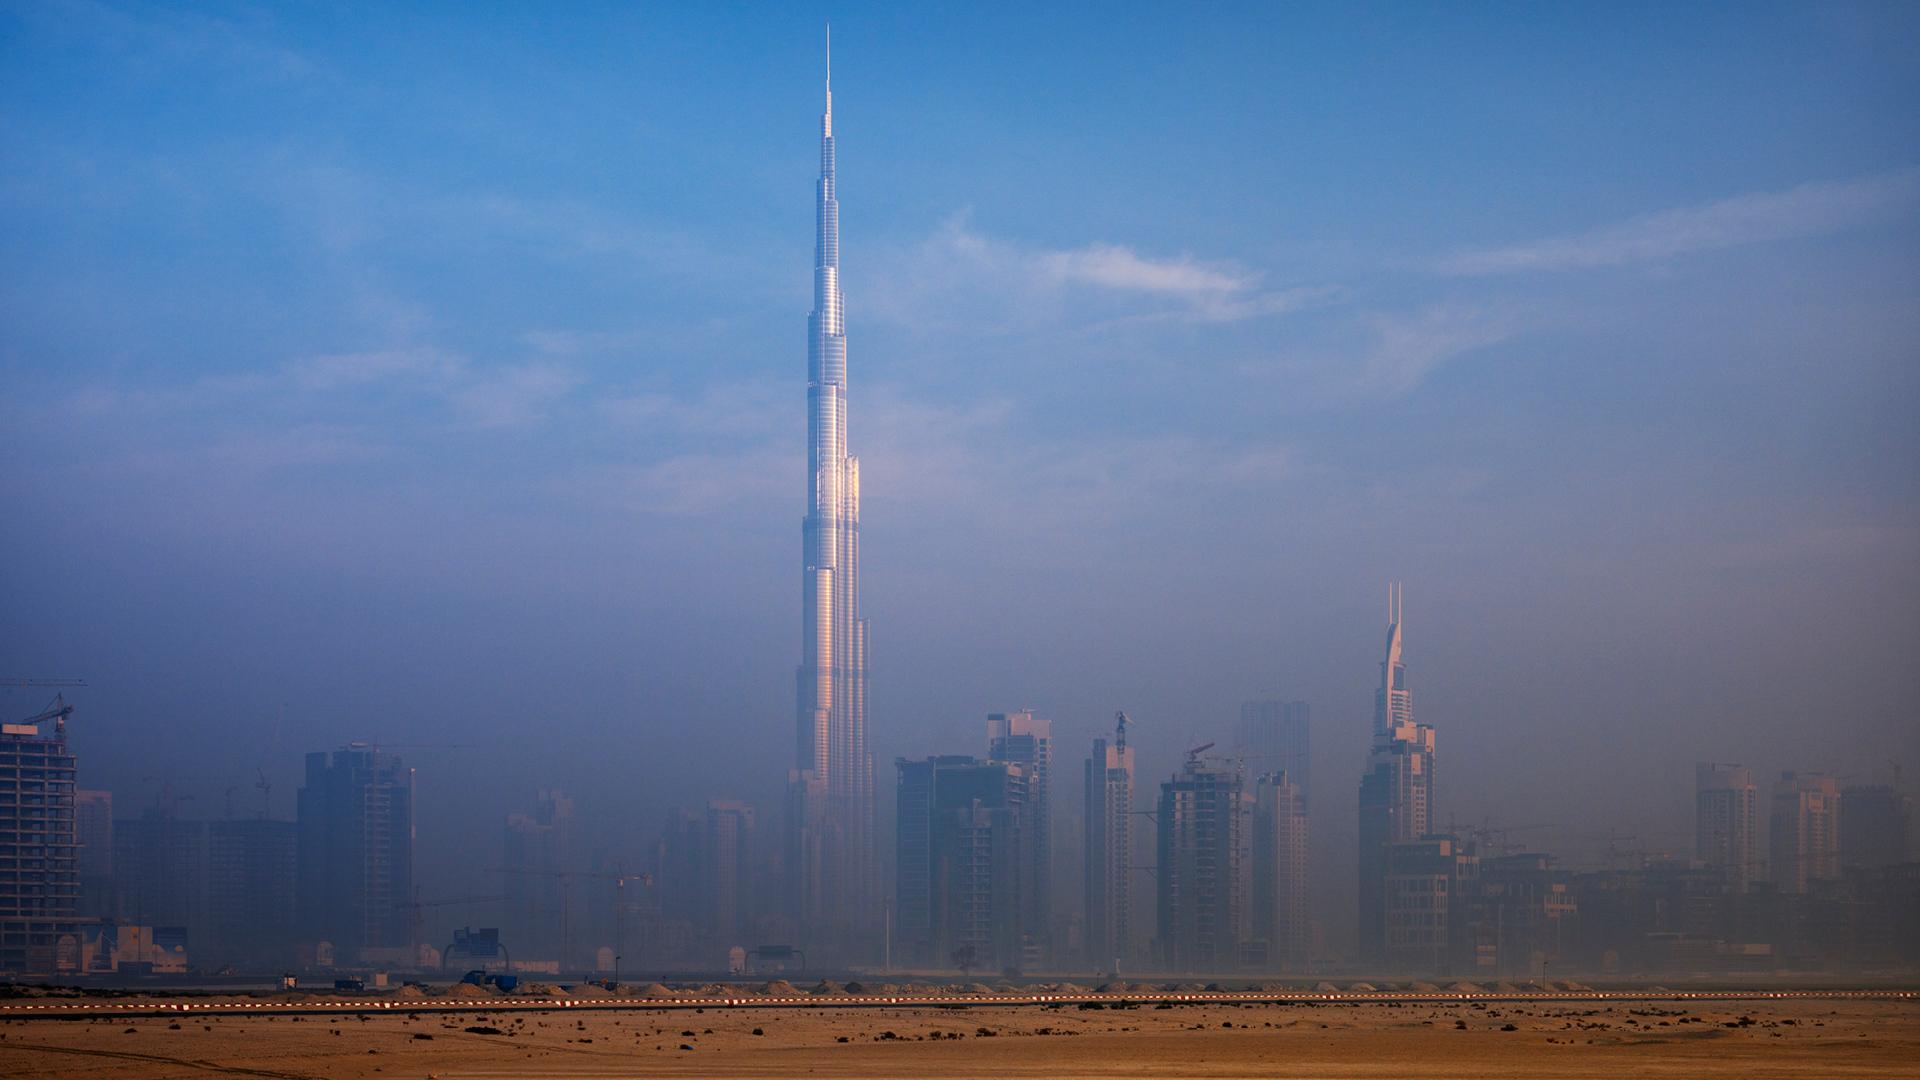 The Burj Khalifa tower in Dubai, 2010 designed by Adrian Smith, Design Partner at SOM  | Adrian Smith | Gordon Gill | STIRworld